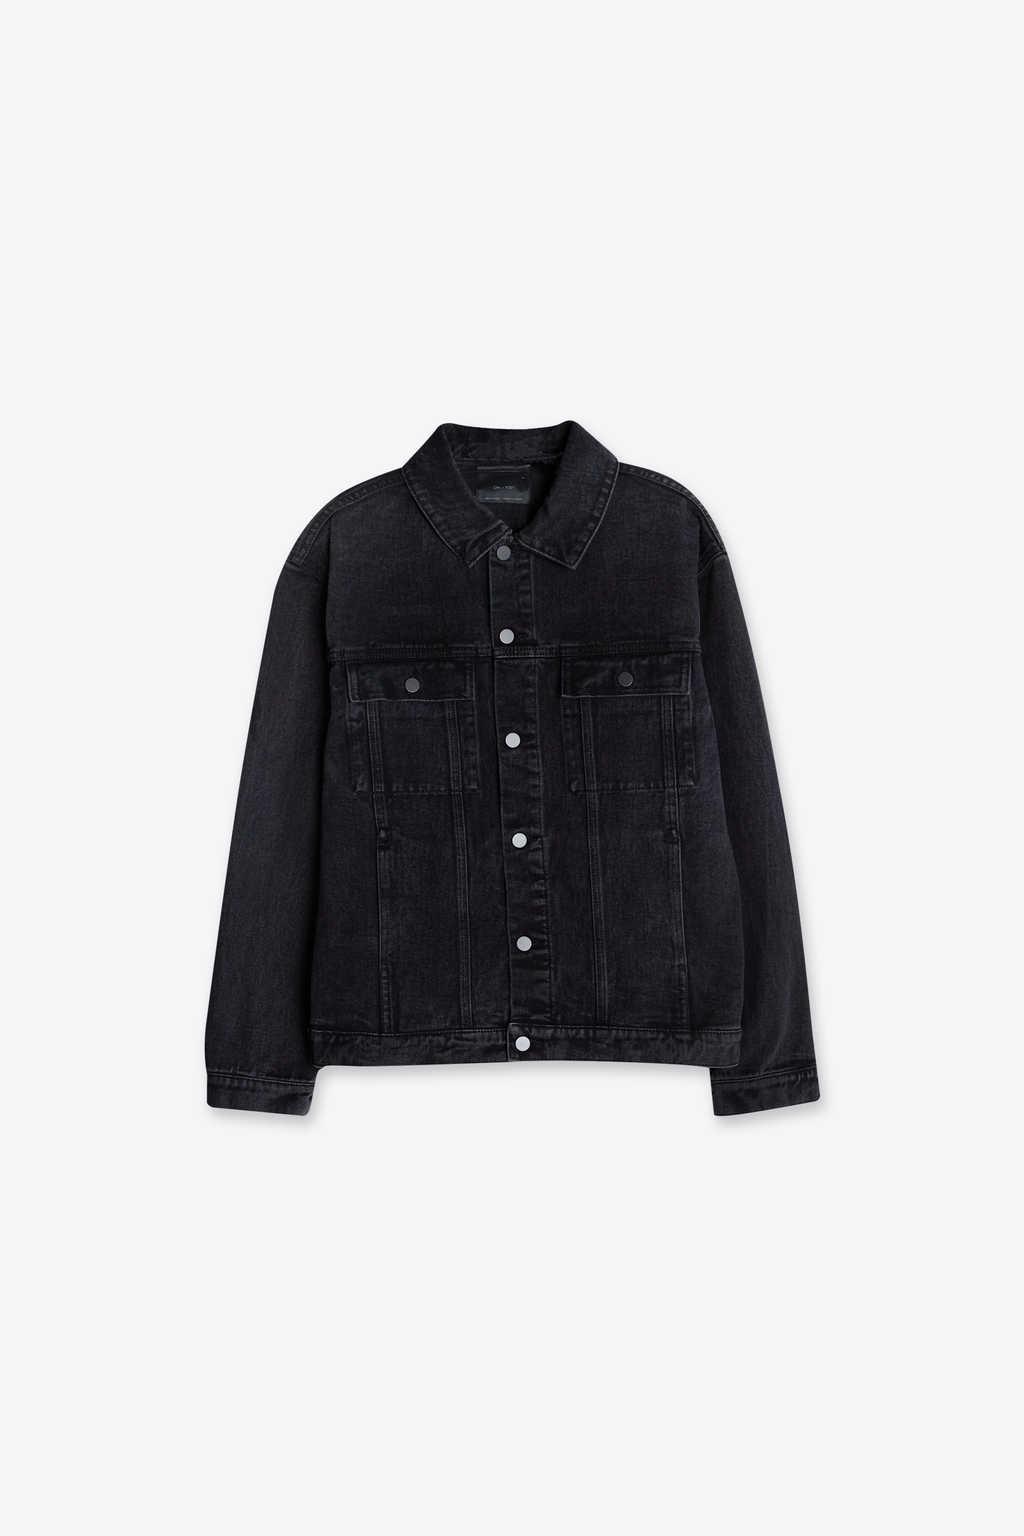 Jacket 2369 Black 13